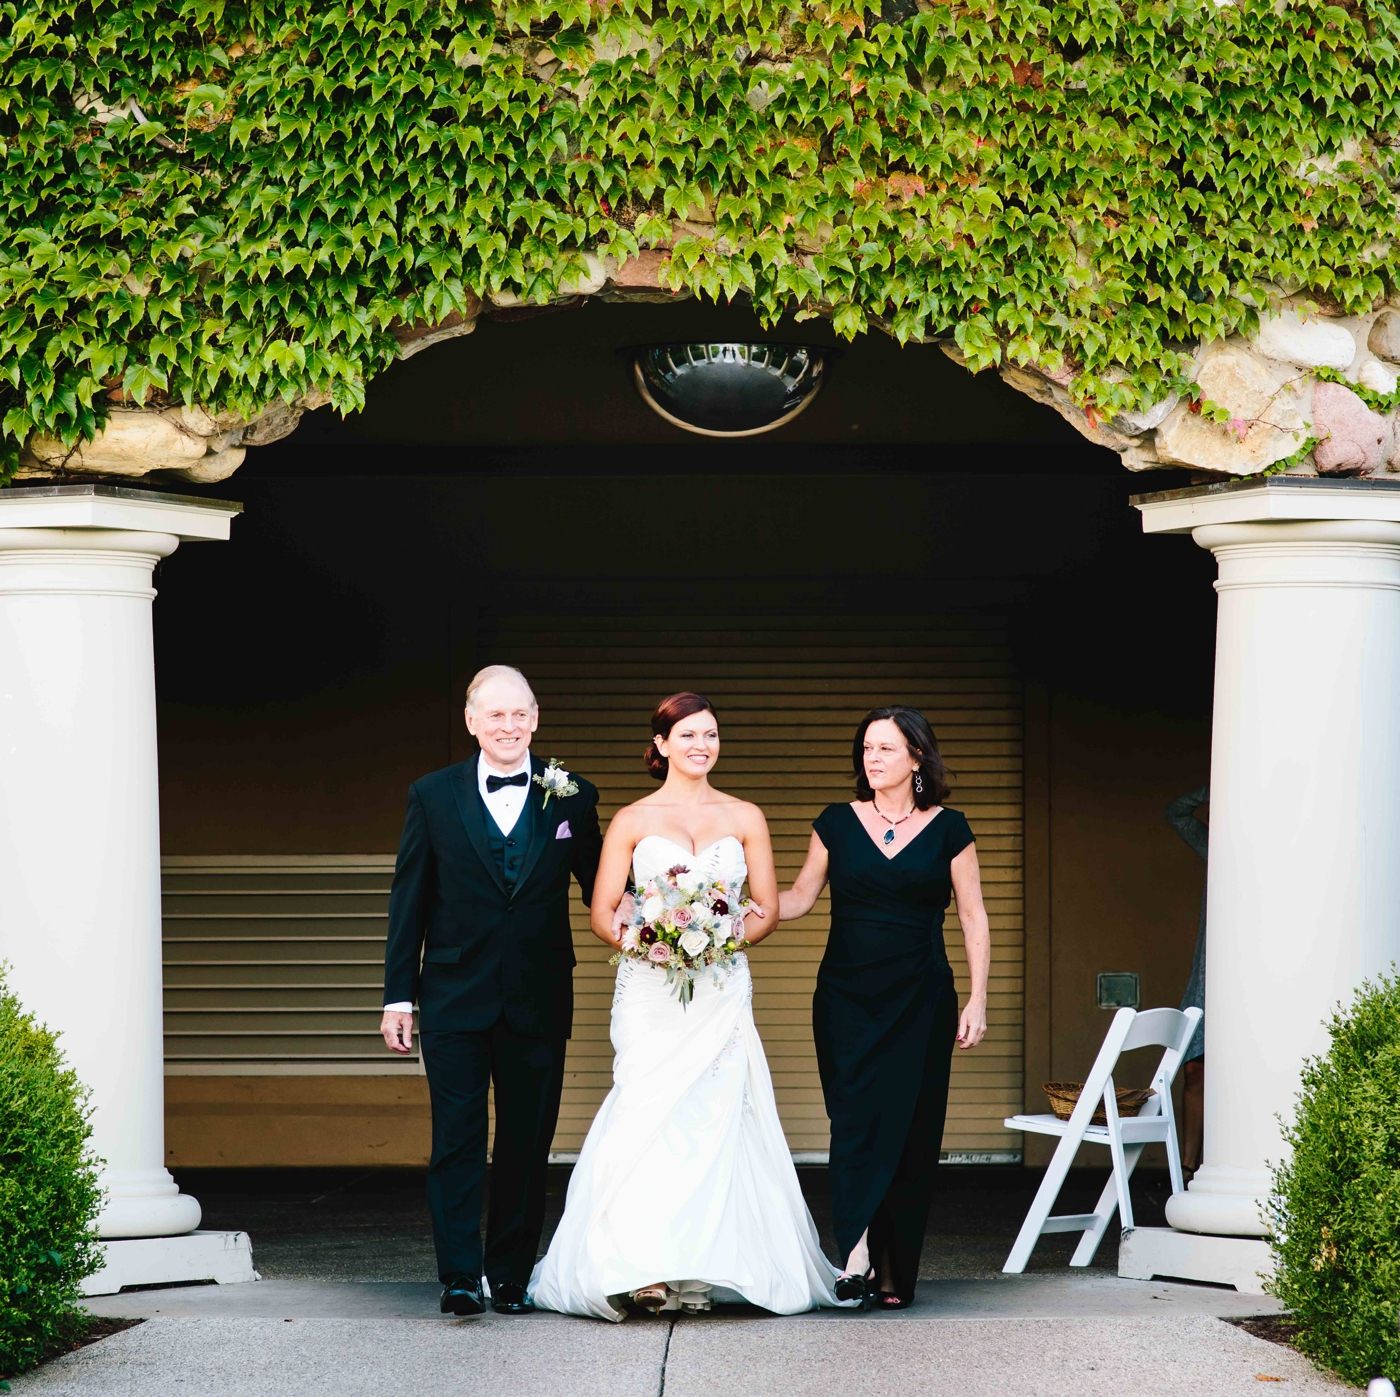 chicago-fine-art-wedding-photography-friel16